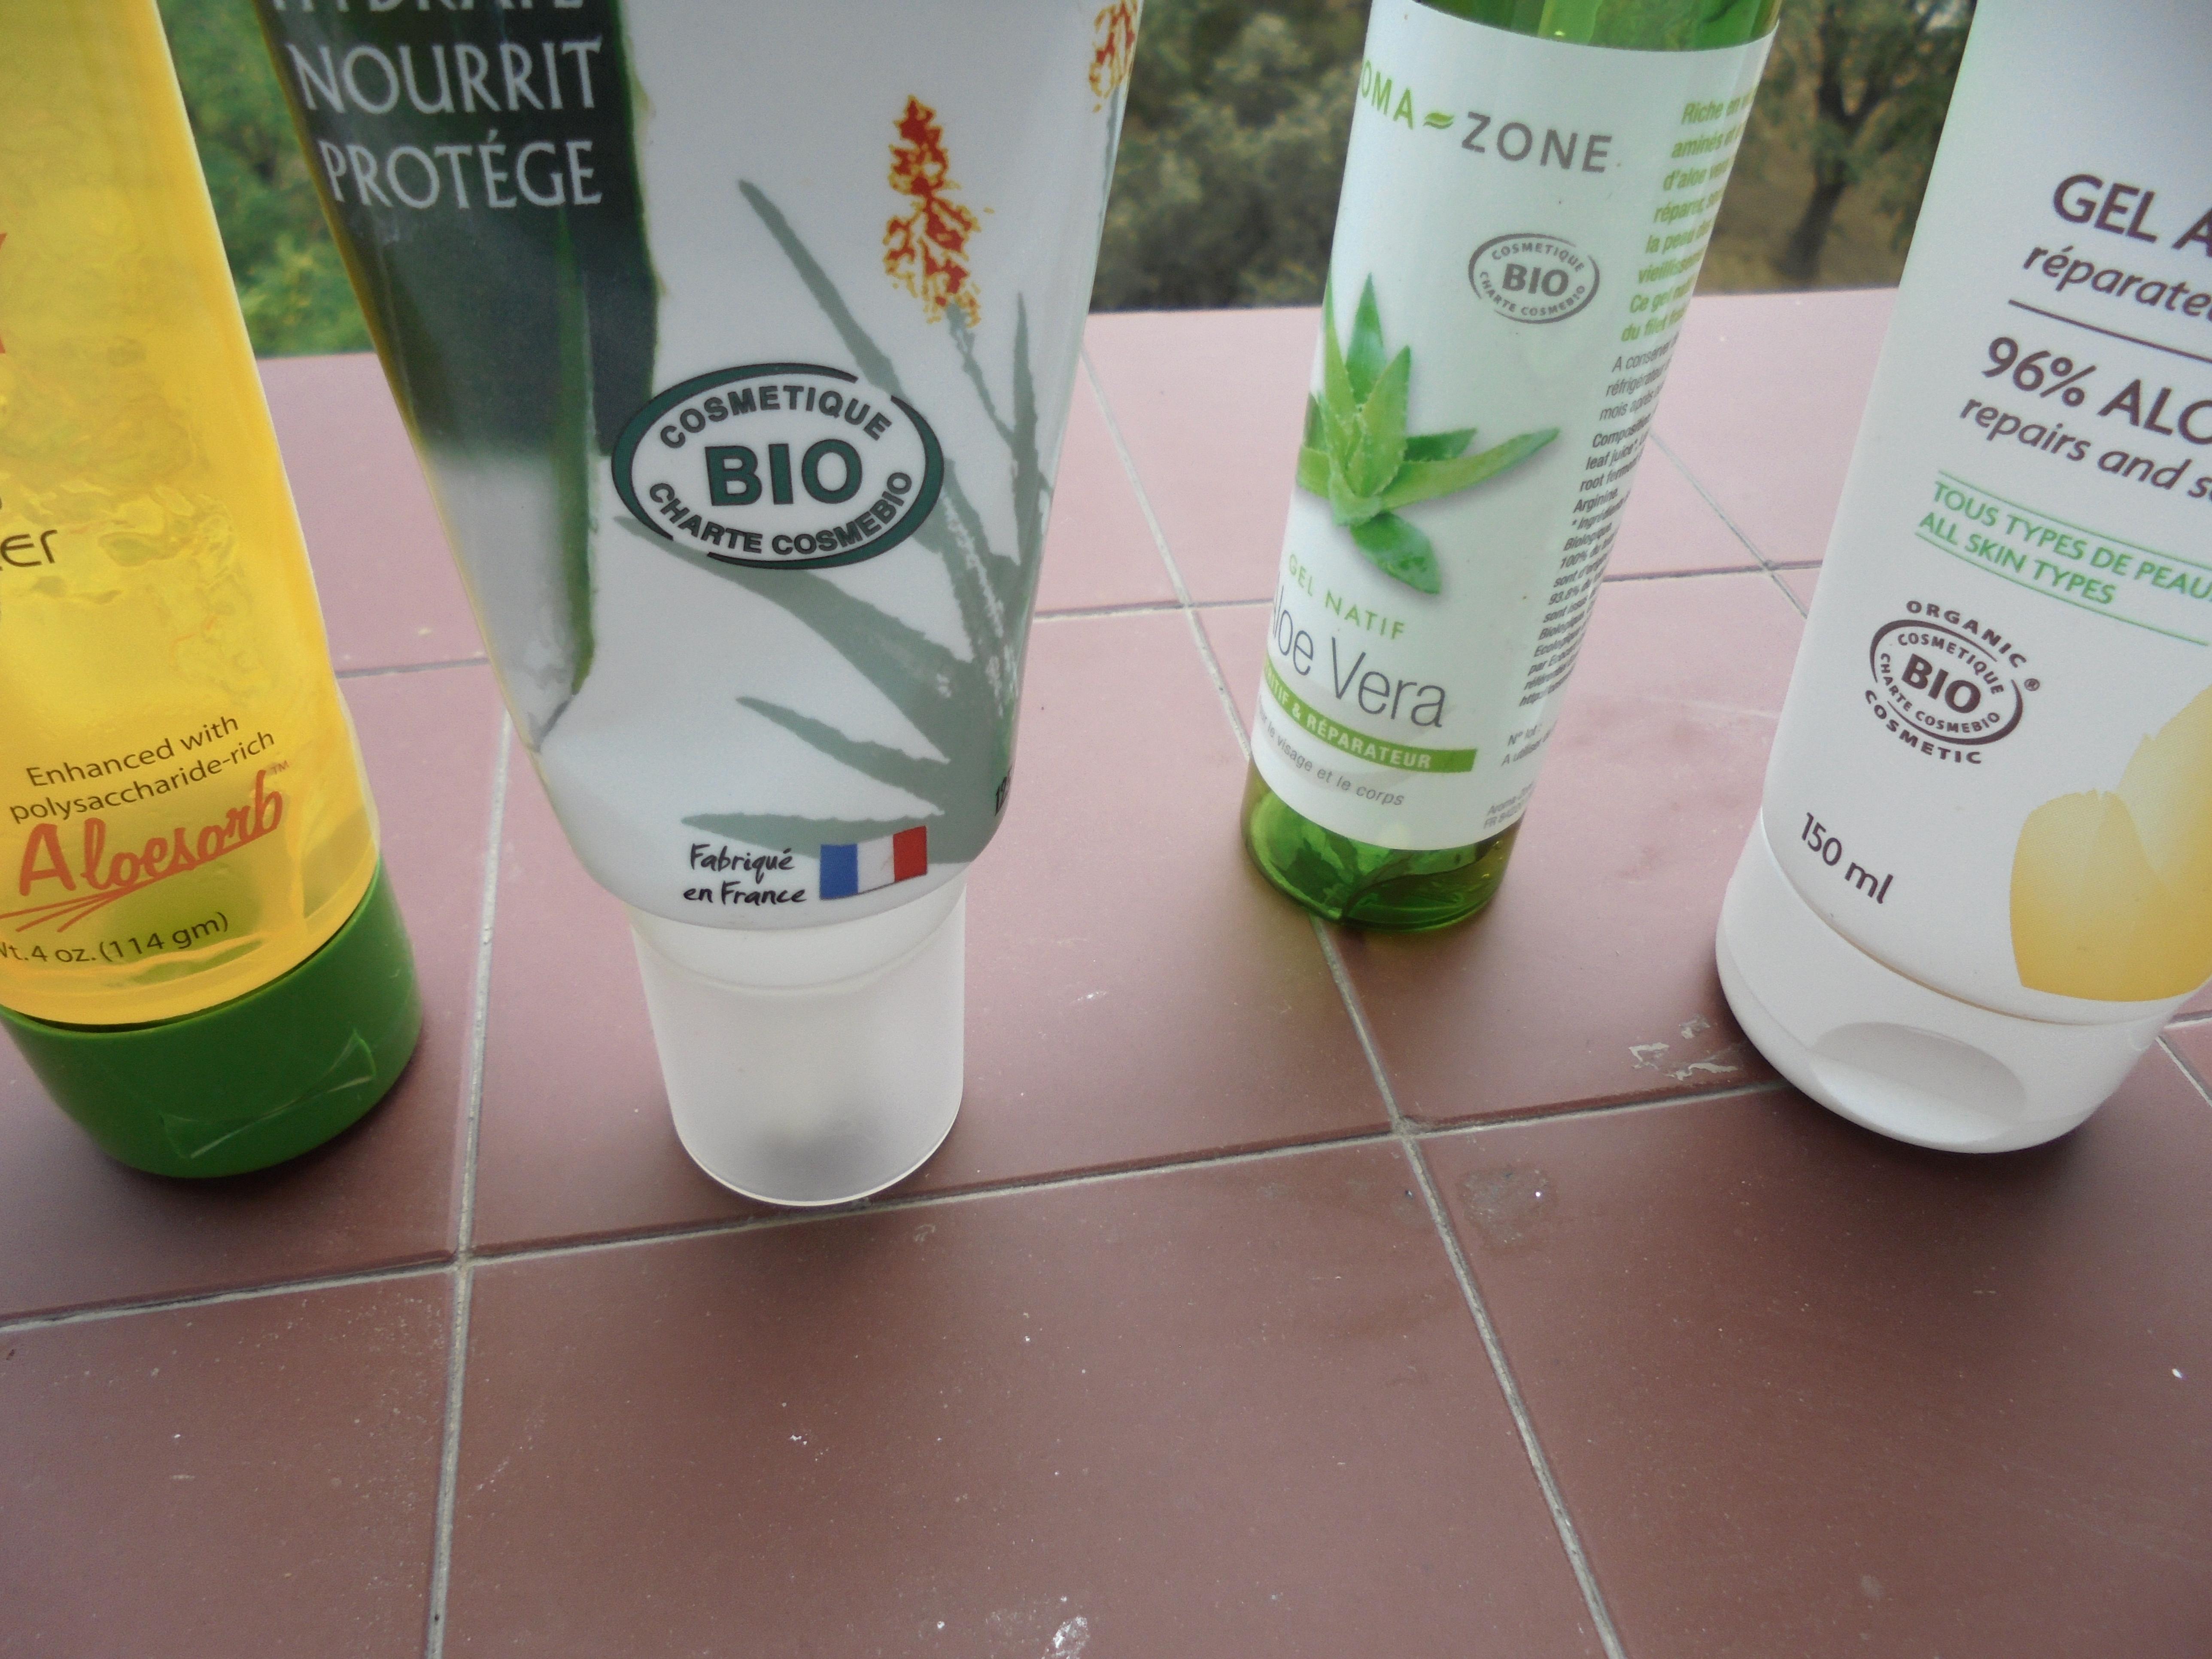 J ai test 4 gels d aloe vera ce que j en pense run - Gel aloe vera pas cher ...